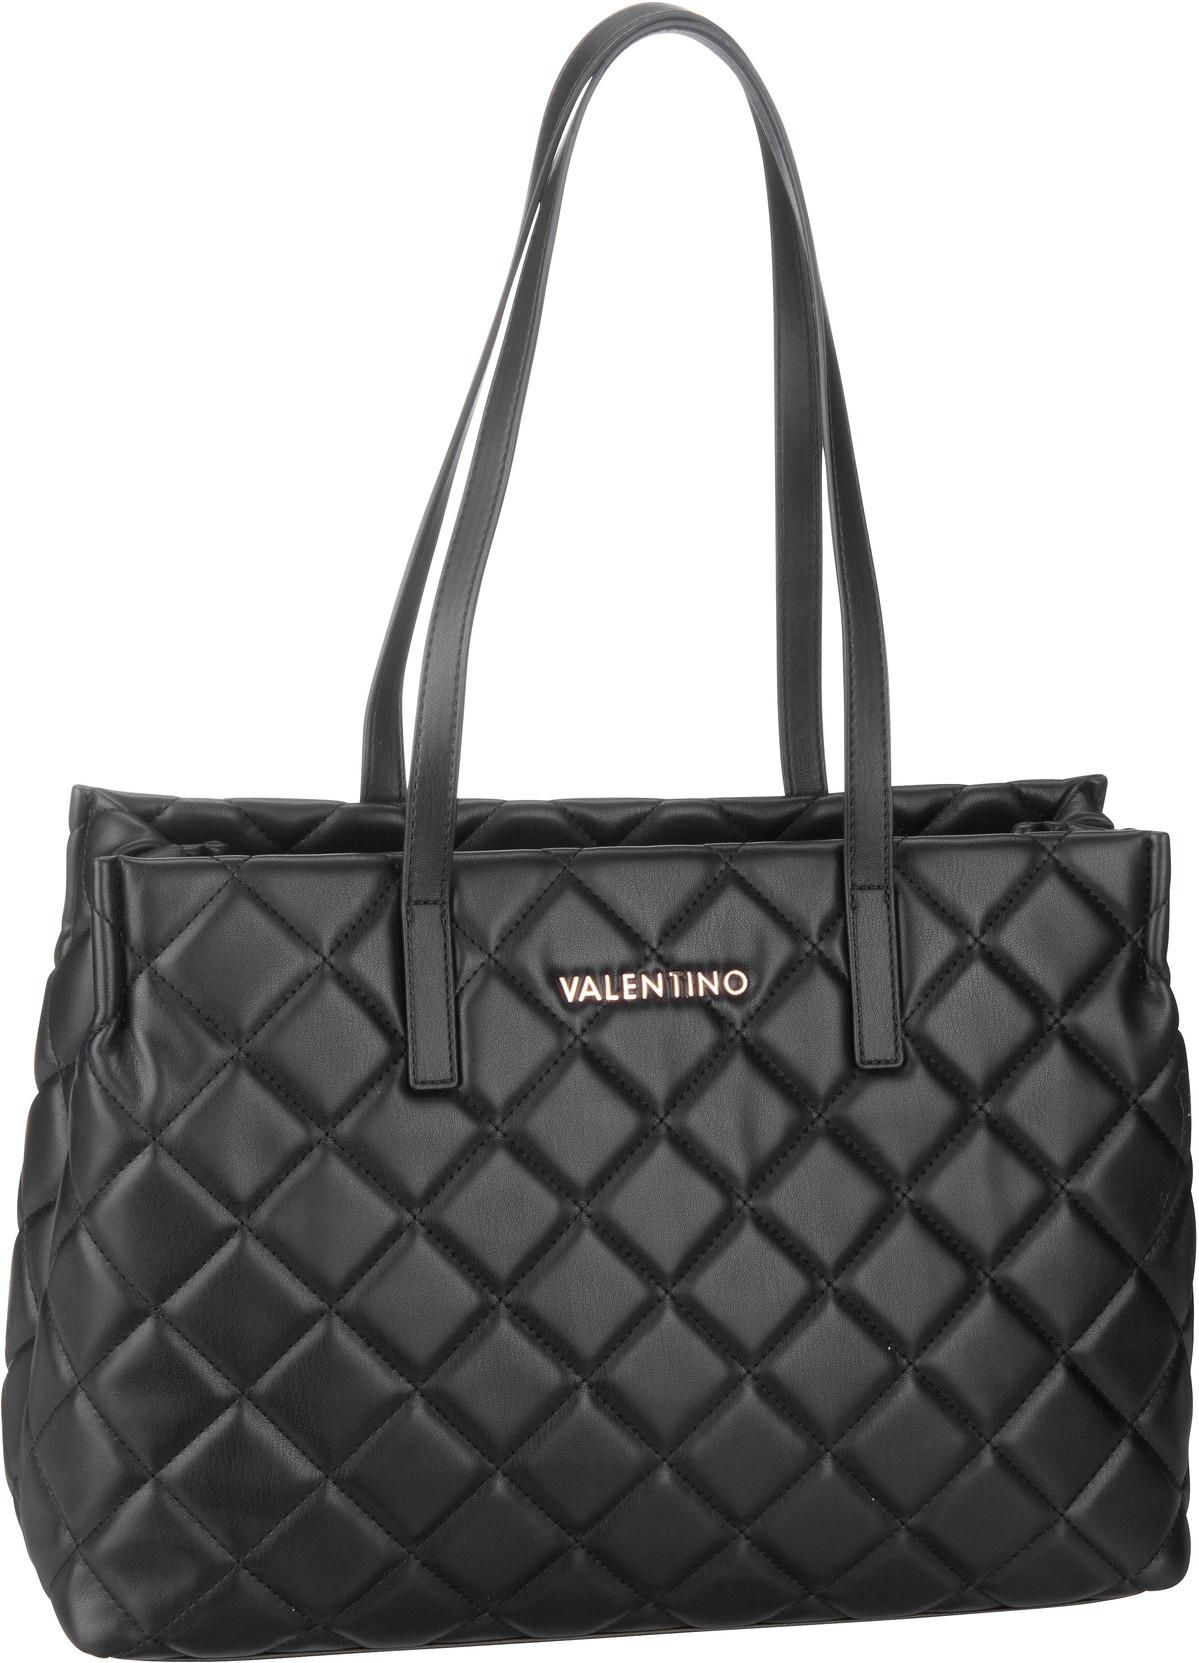 Bags Handtasche Ocarina Shopping K10 Black